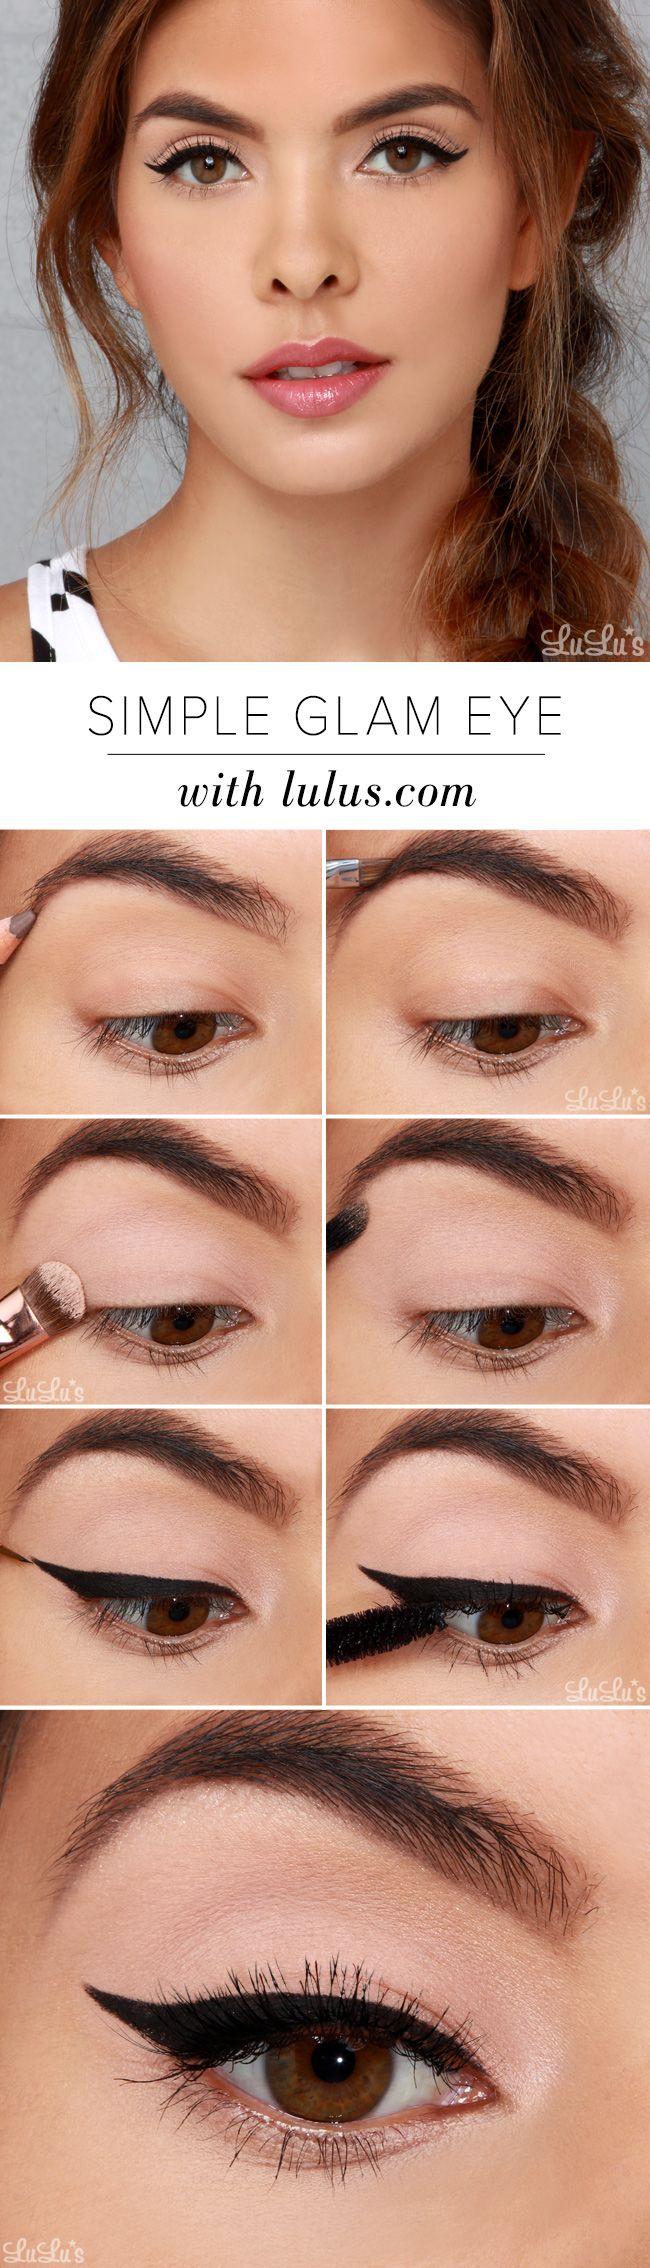 Simple Cat Eye Makeup Tutorial Driveeapusedmotorhomefo